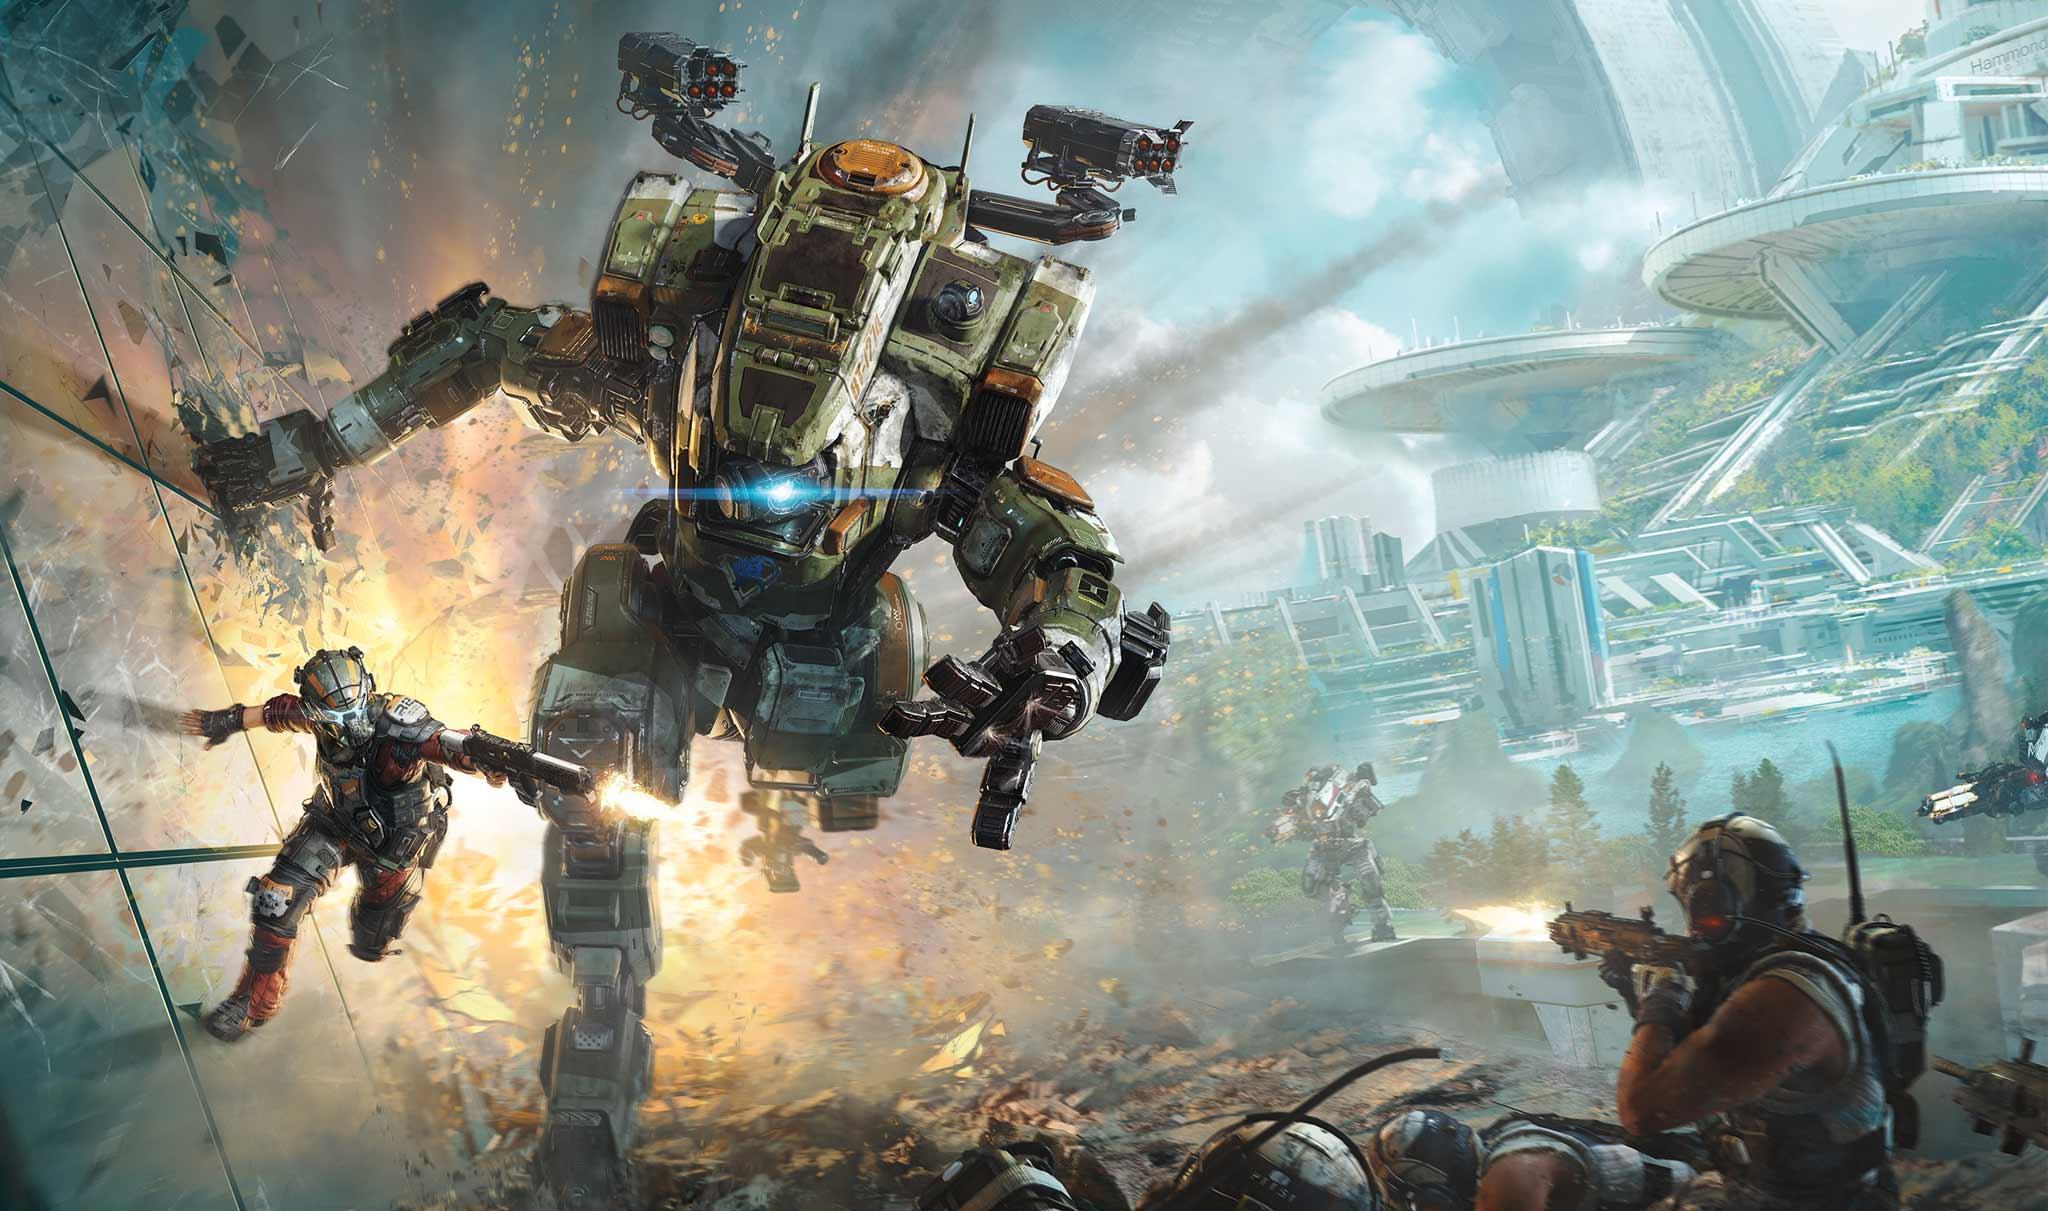 Origin: Titanfall 2 PC Prueba gratuita de 10,000 horas